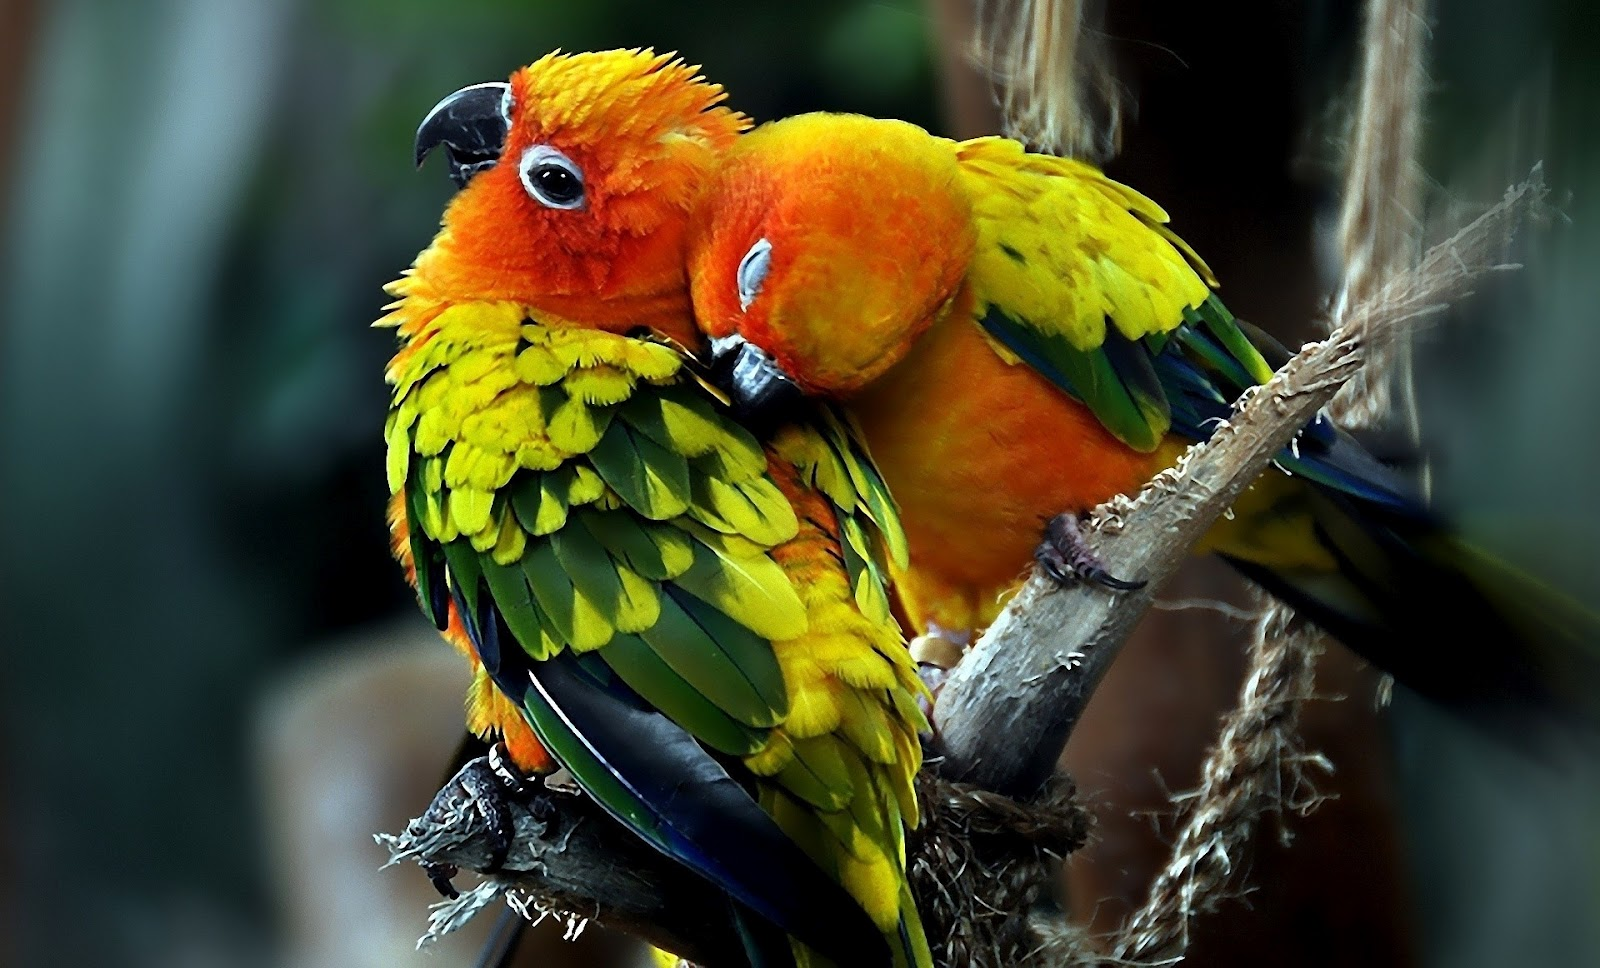 http://3.bp.blogspot.com/-JODfM03tJ4Y/UDx8g_AhotI/AAAAAAAAAZM/e9caWO1nWug/s1600/49579-beautiful-birds-cute-parrots-.jpg